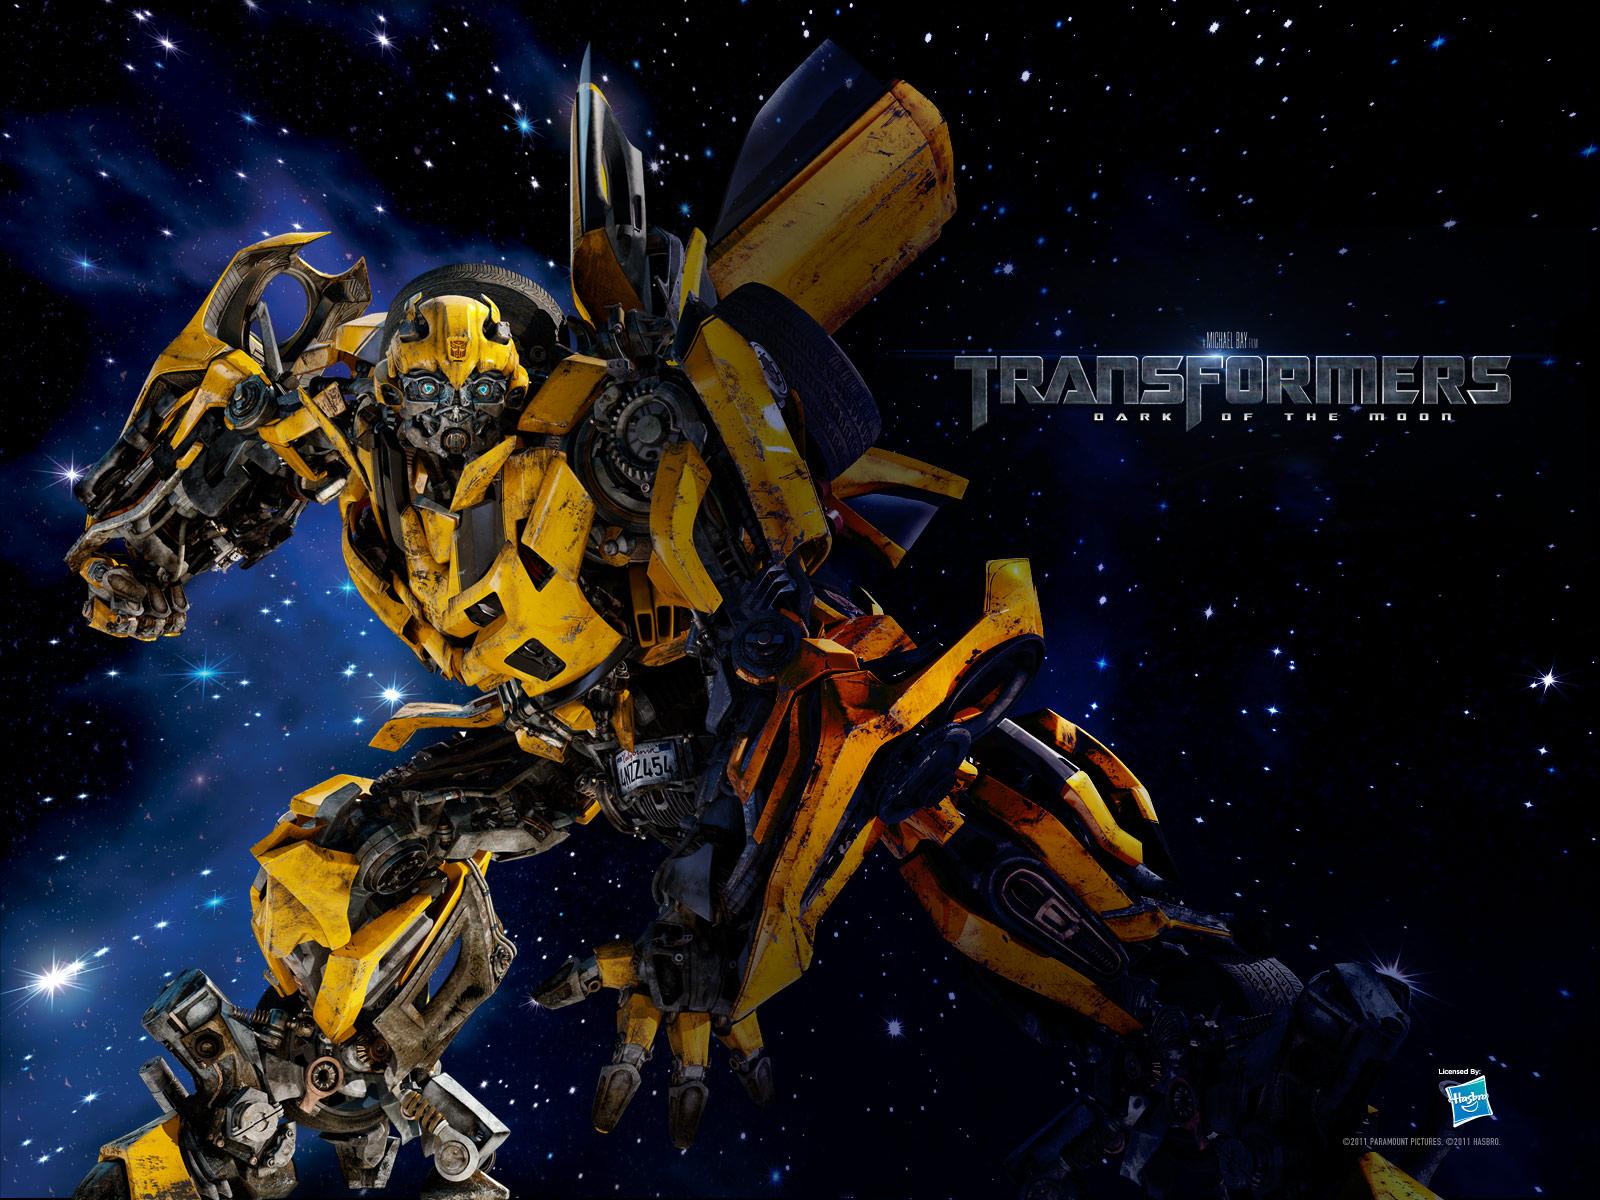 Download Transformers Matrix Wallpapers Bumblebee Movie Hd